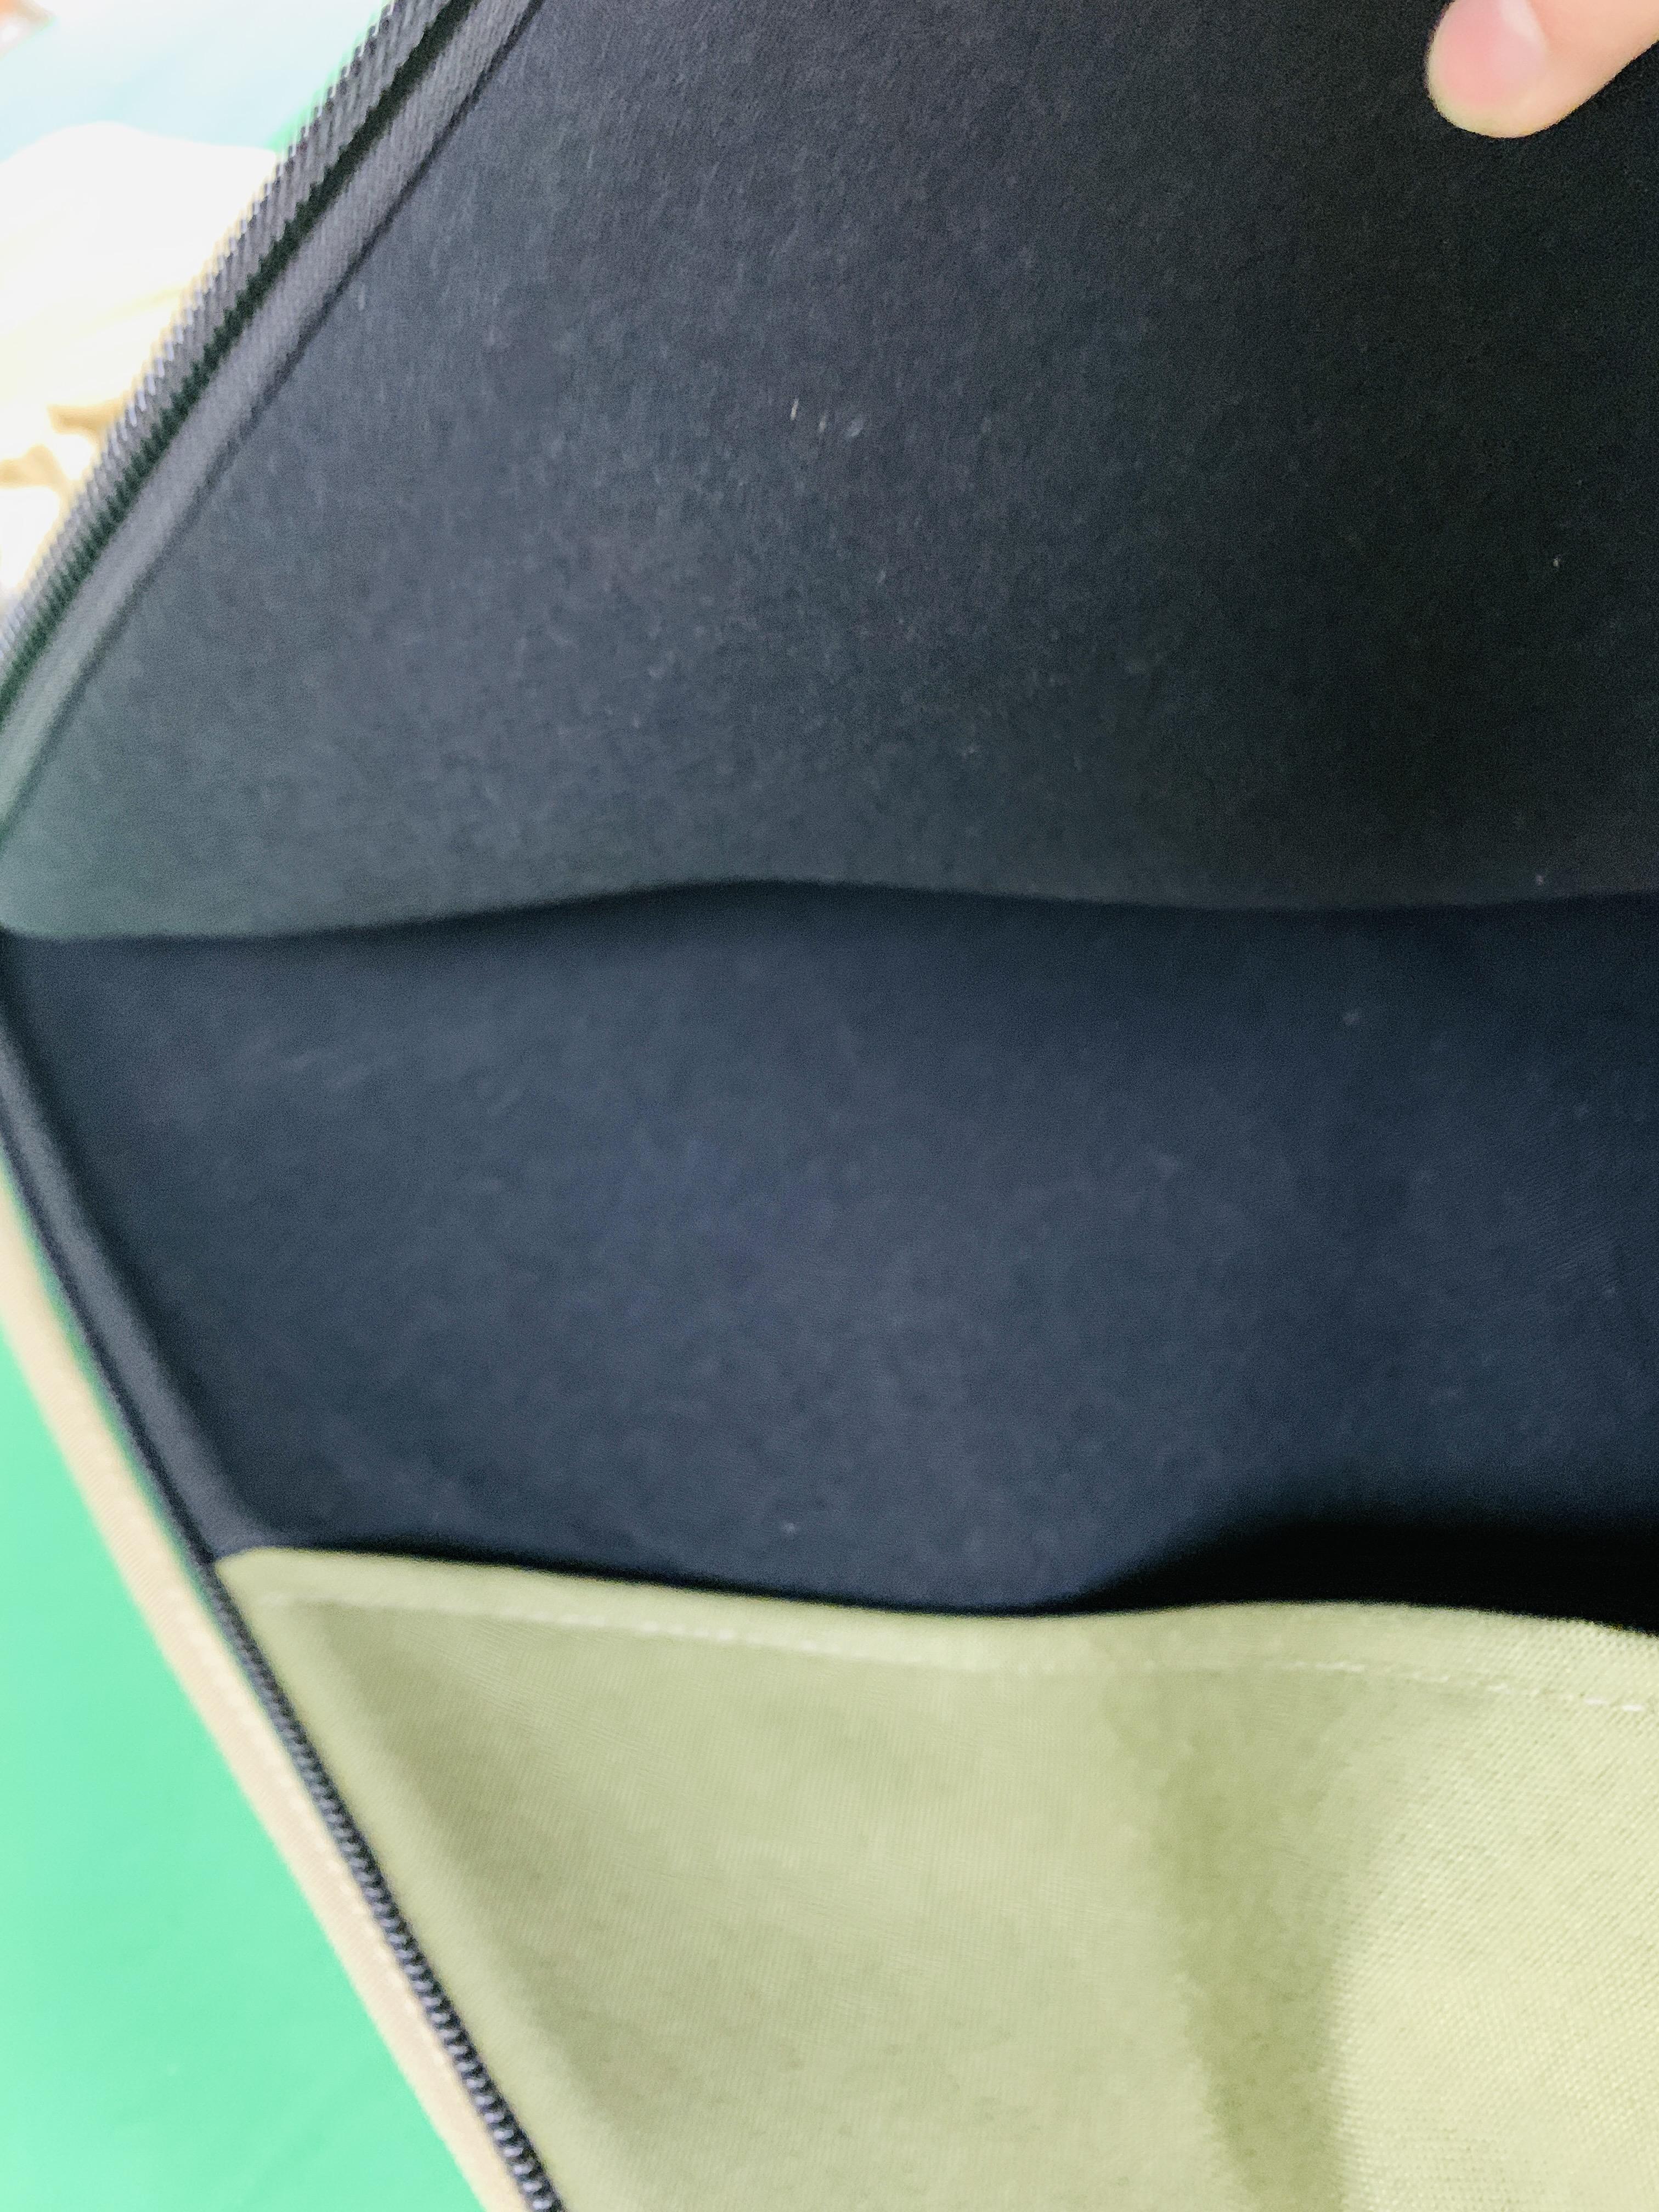 A OGDEN QUICKSLIP RIFLE SLIP WITH INTERNAL POCKETS 1. - Image 6 of 7